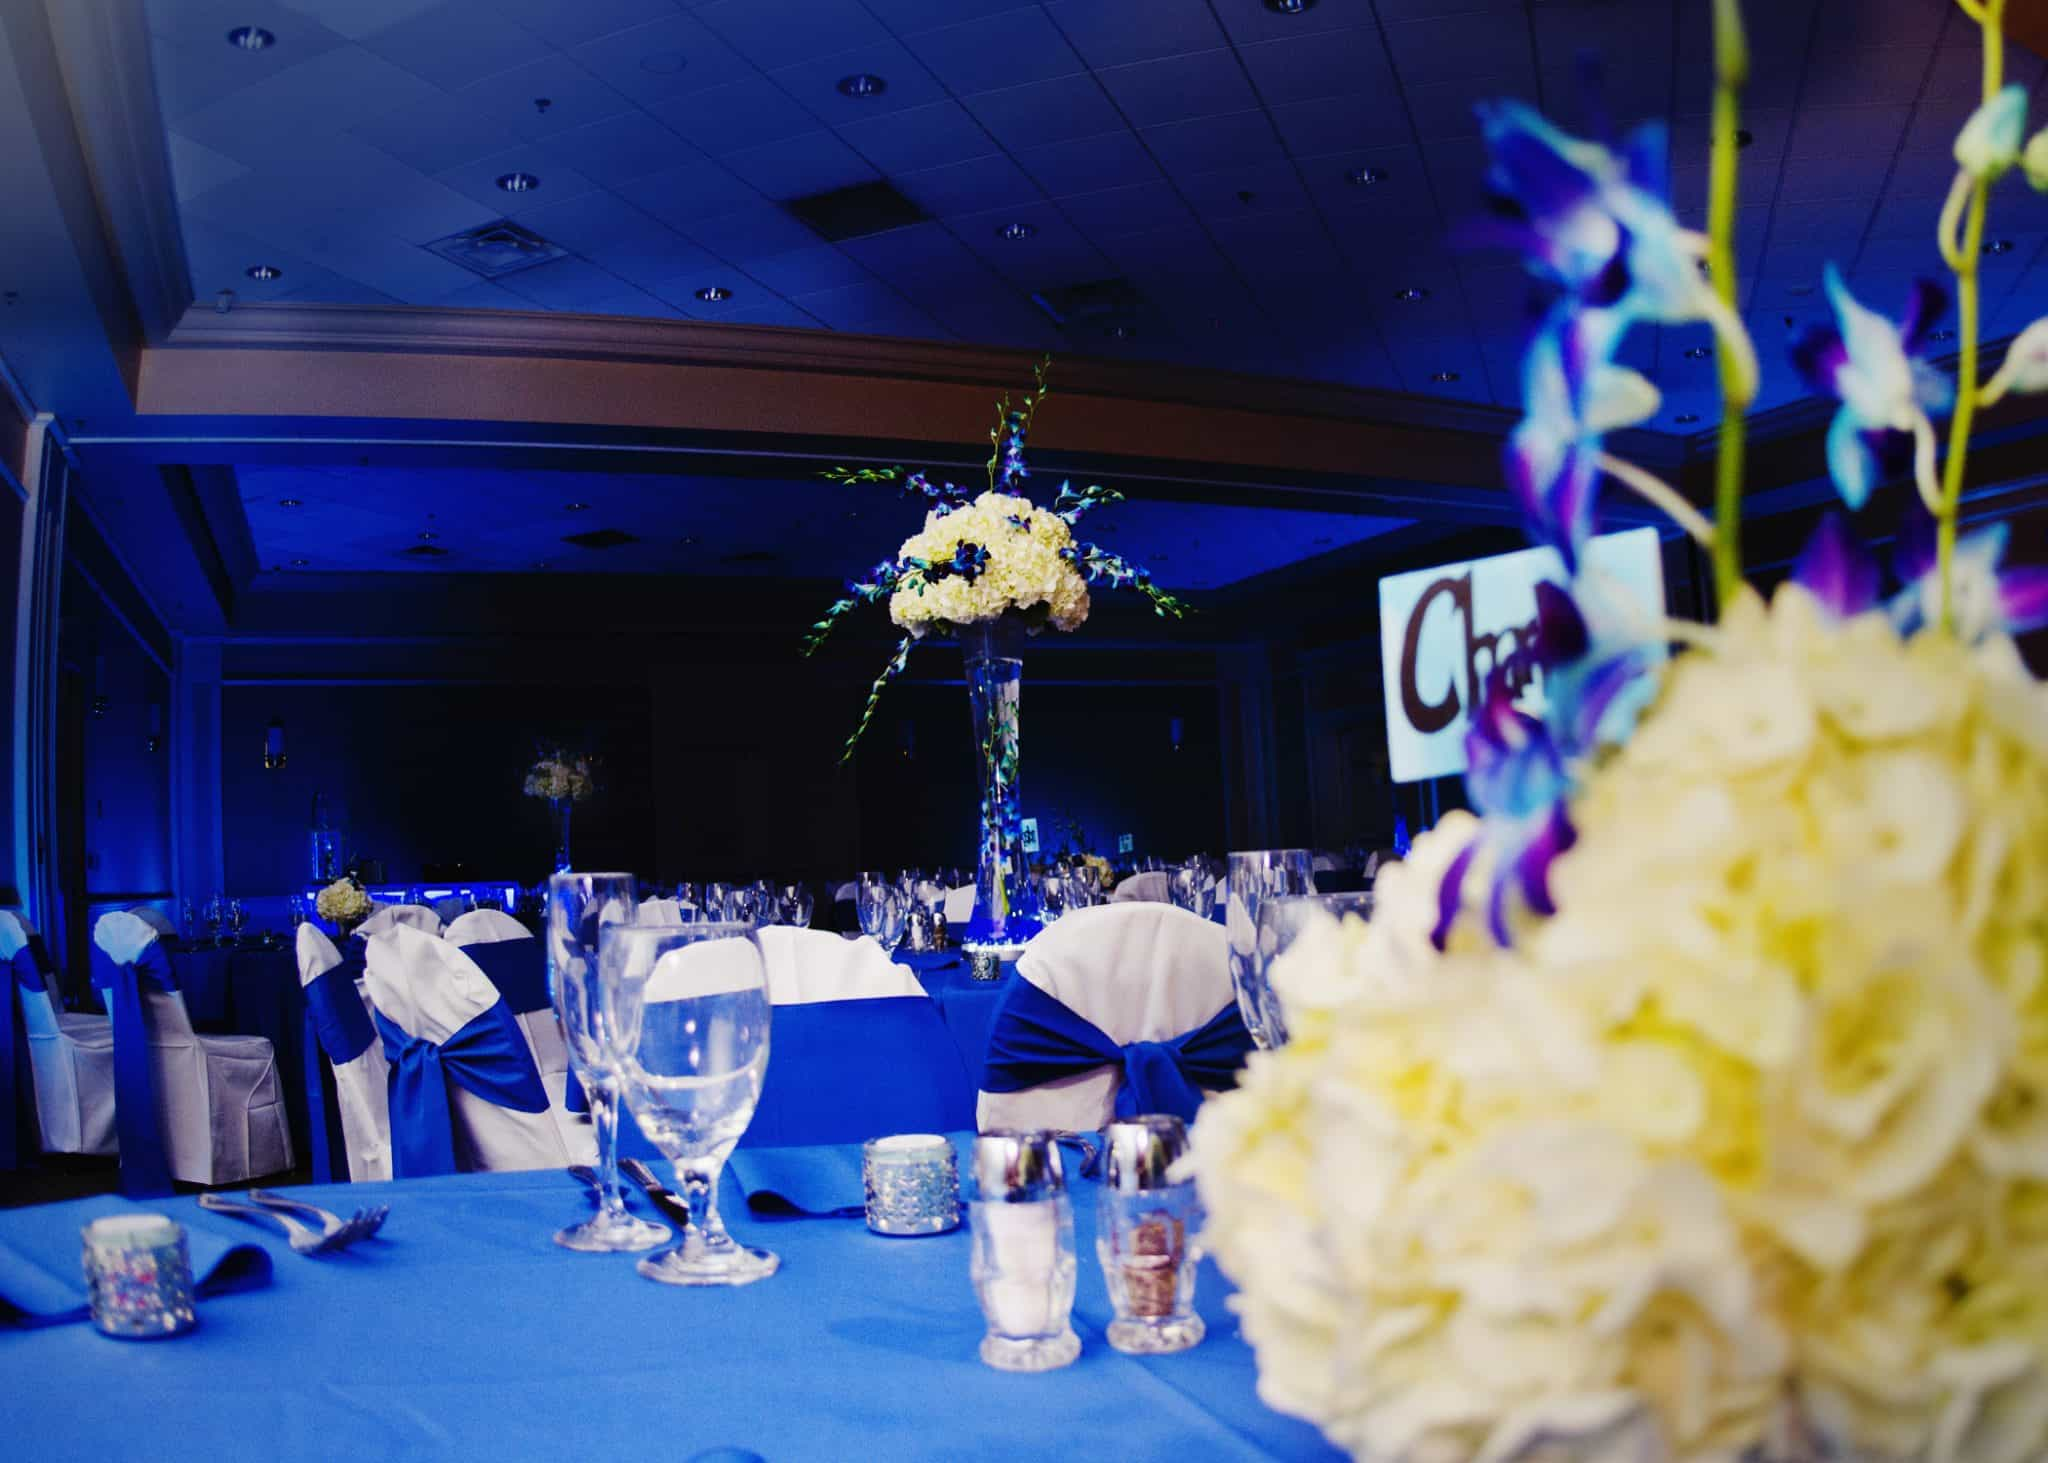 leu gardens orlando fl sapphire blue wedding uplighting